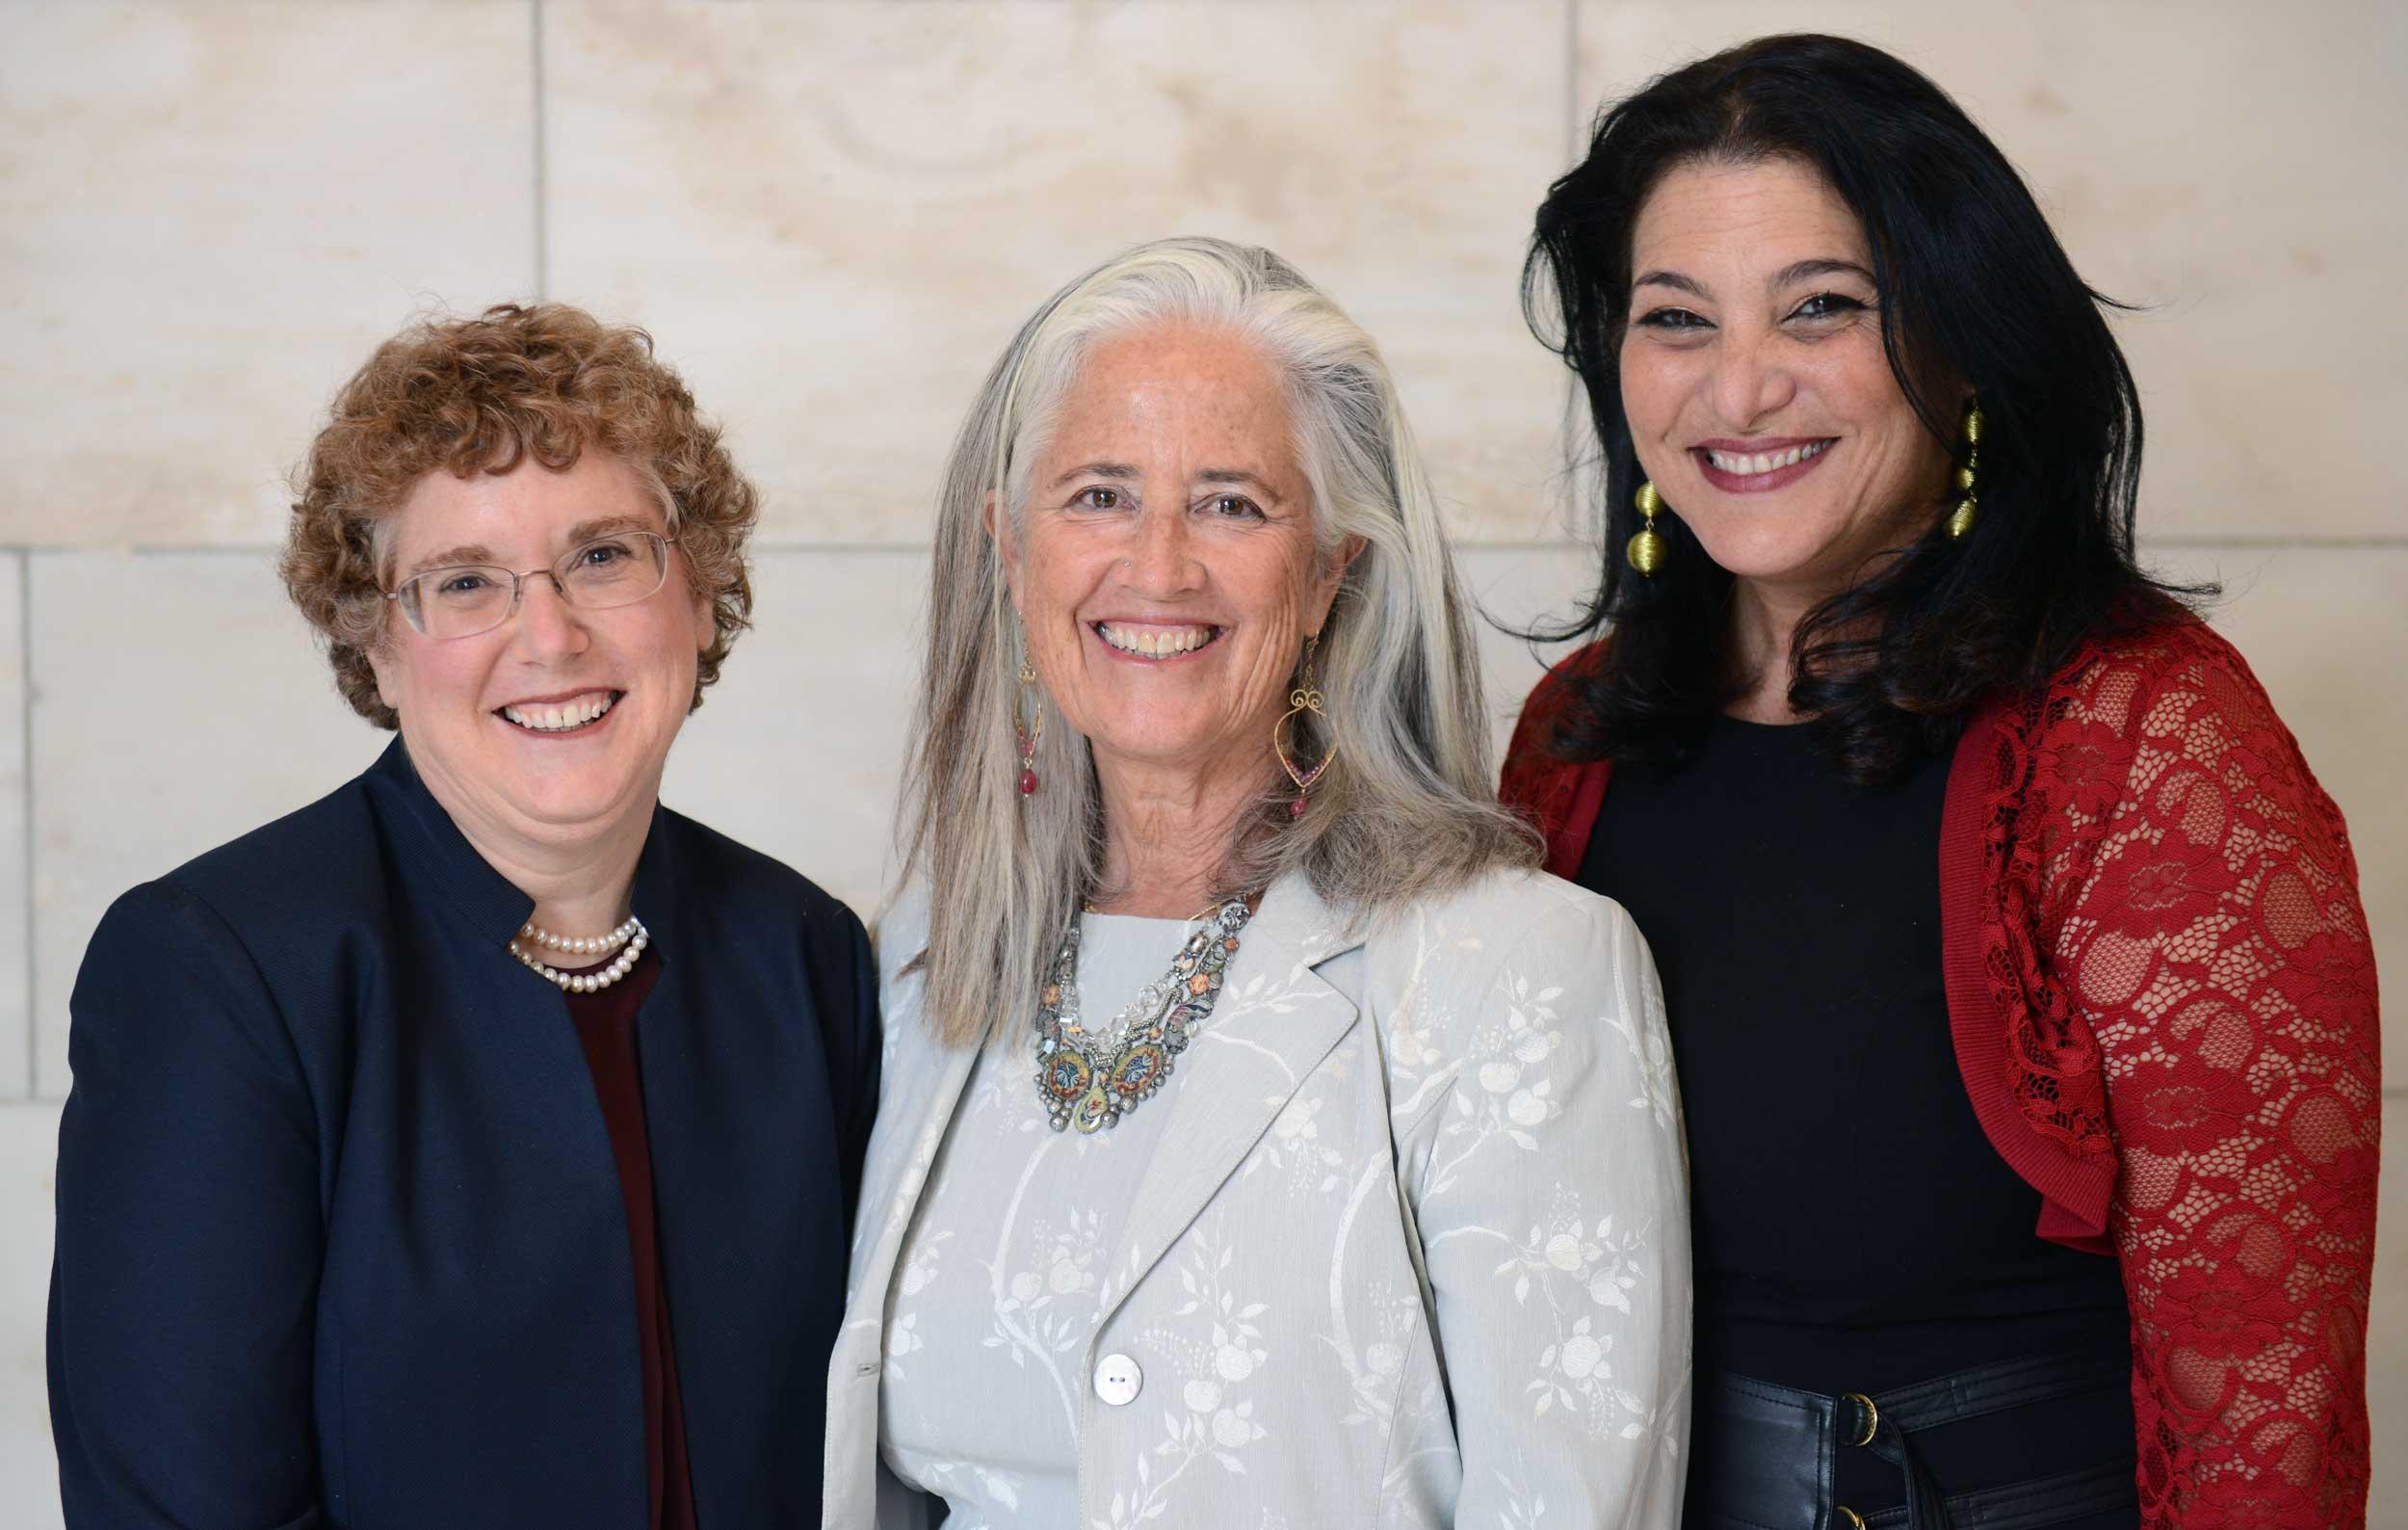 Naomi Ackerman, Deborah Newbrun and Dr. Susie Tanchel Receive the 2018 Covenant Award at Annual Ceremony in New York